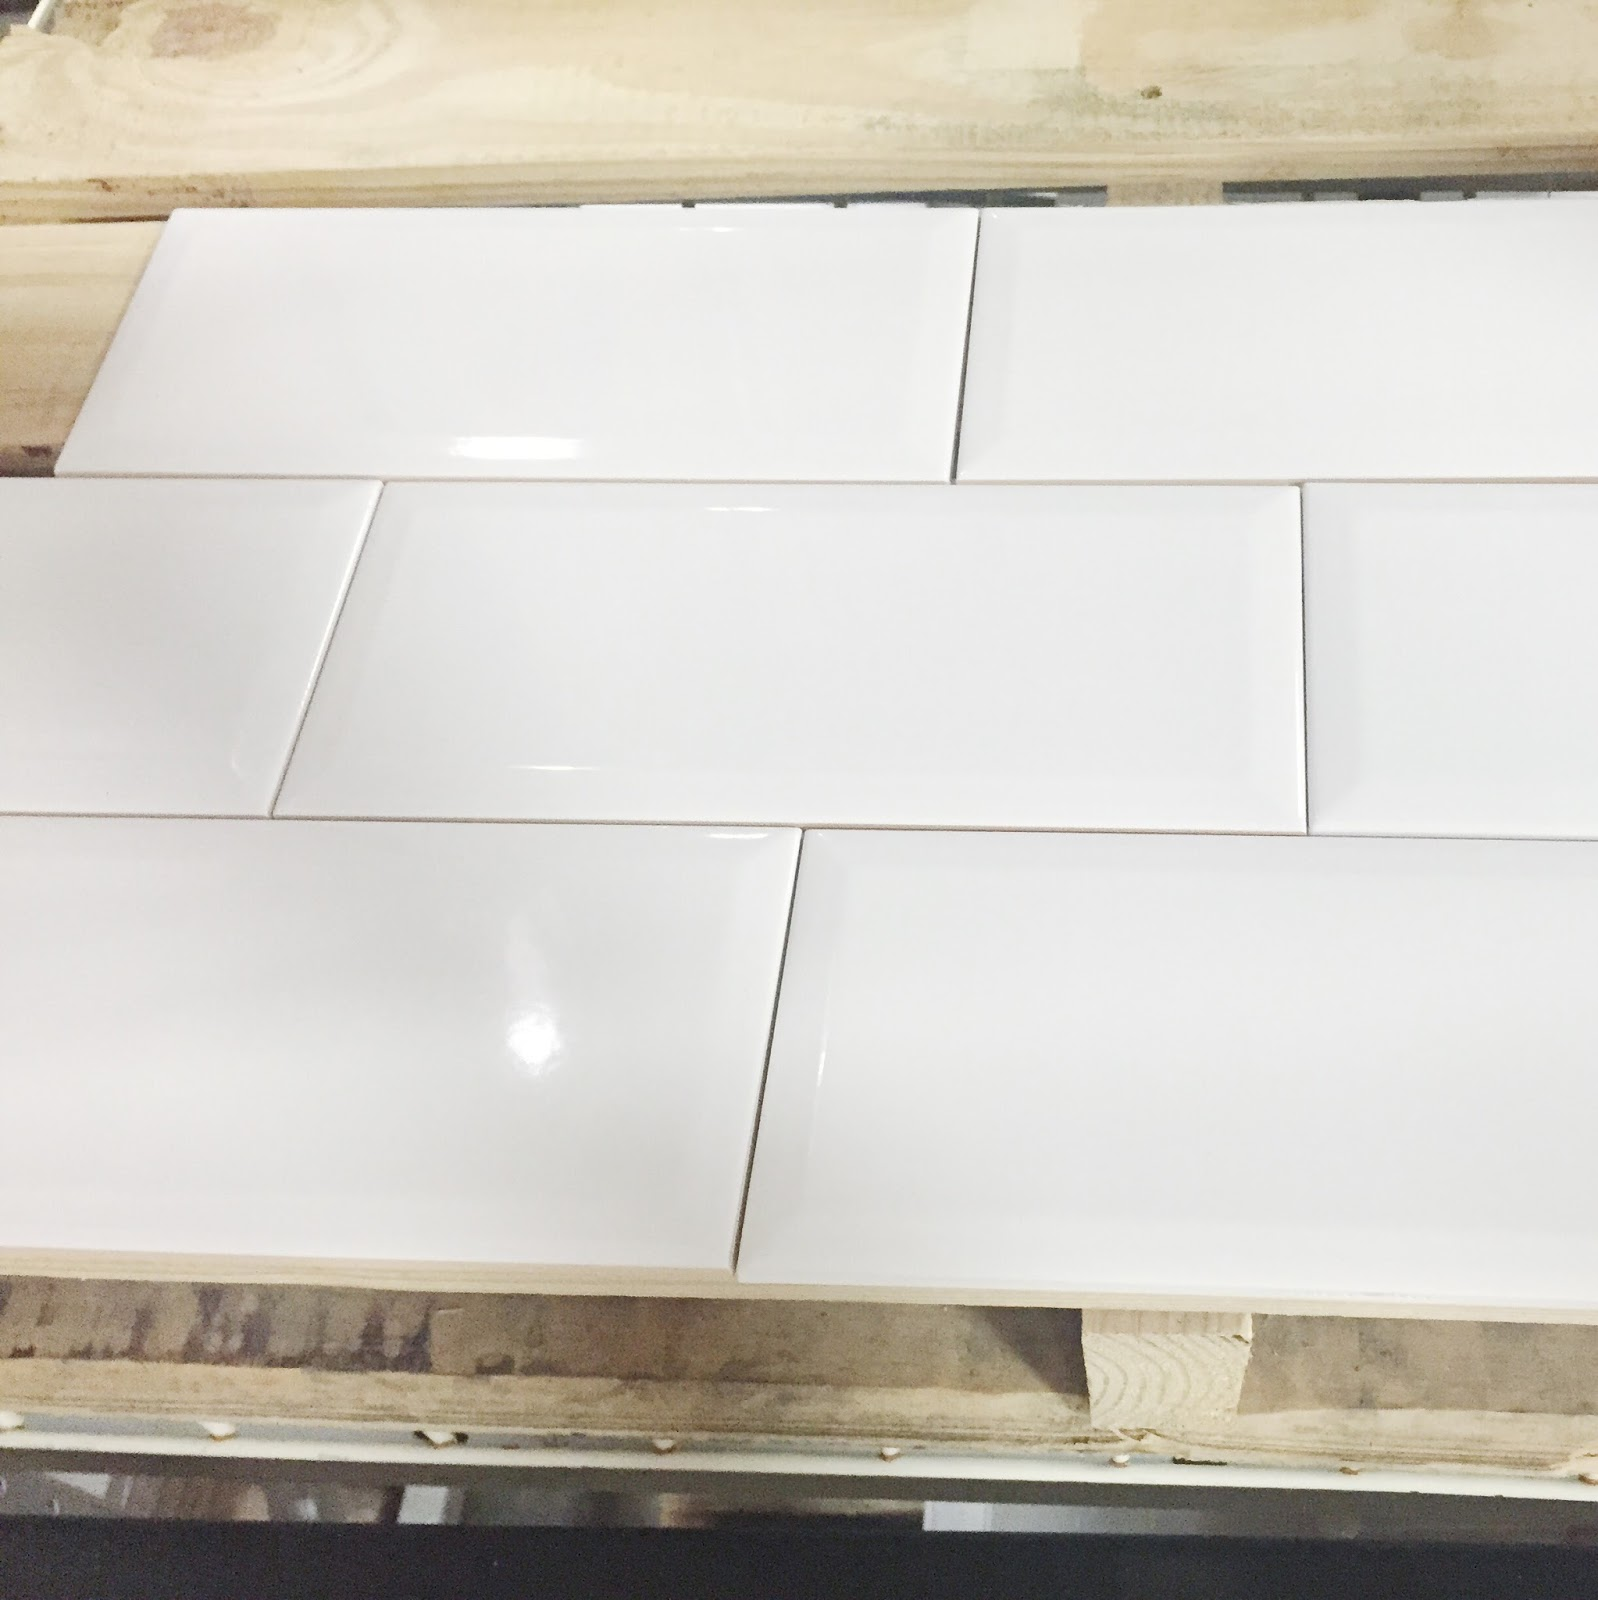 Stacy charlie for Carrara marble slab remnants